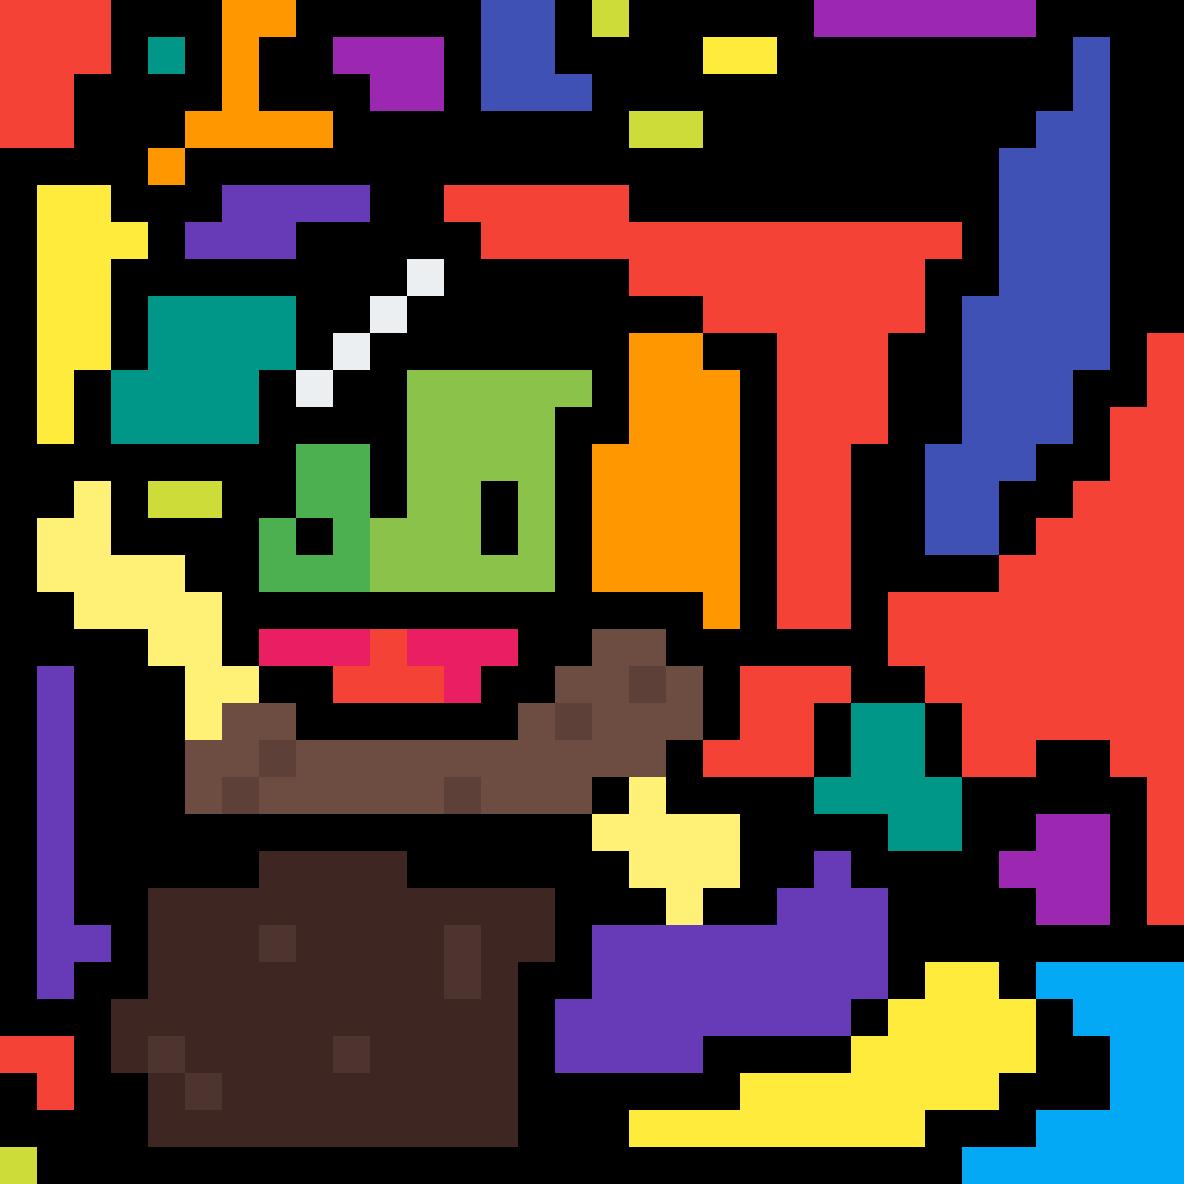 Pixl Frog by willbert03